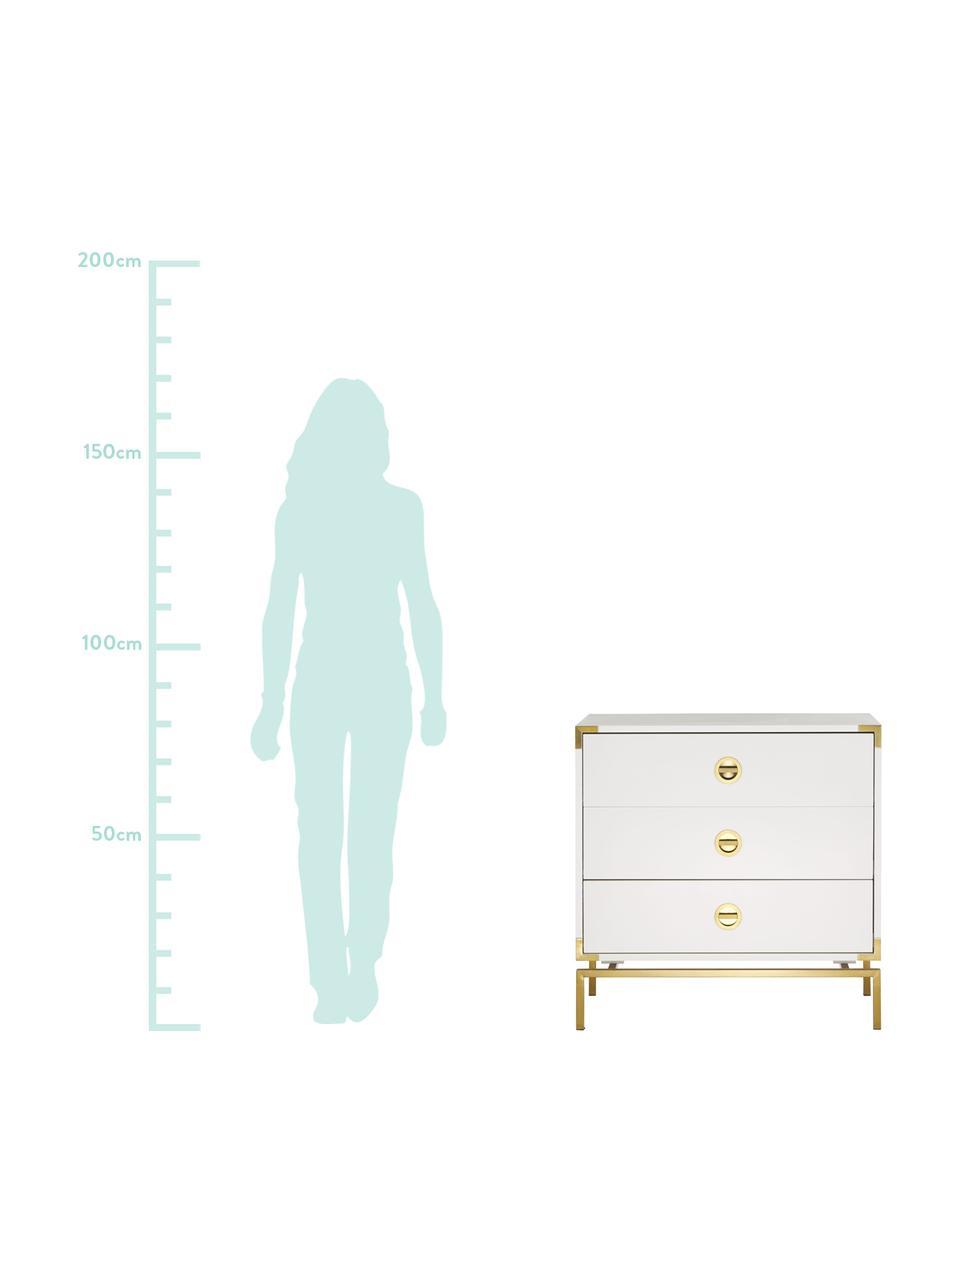 Cassettiera bianca Elegance, Bianco, Larg. 80 x Alt. 80 cm